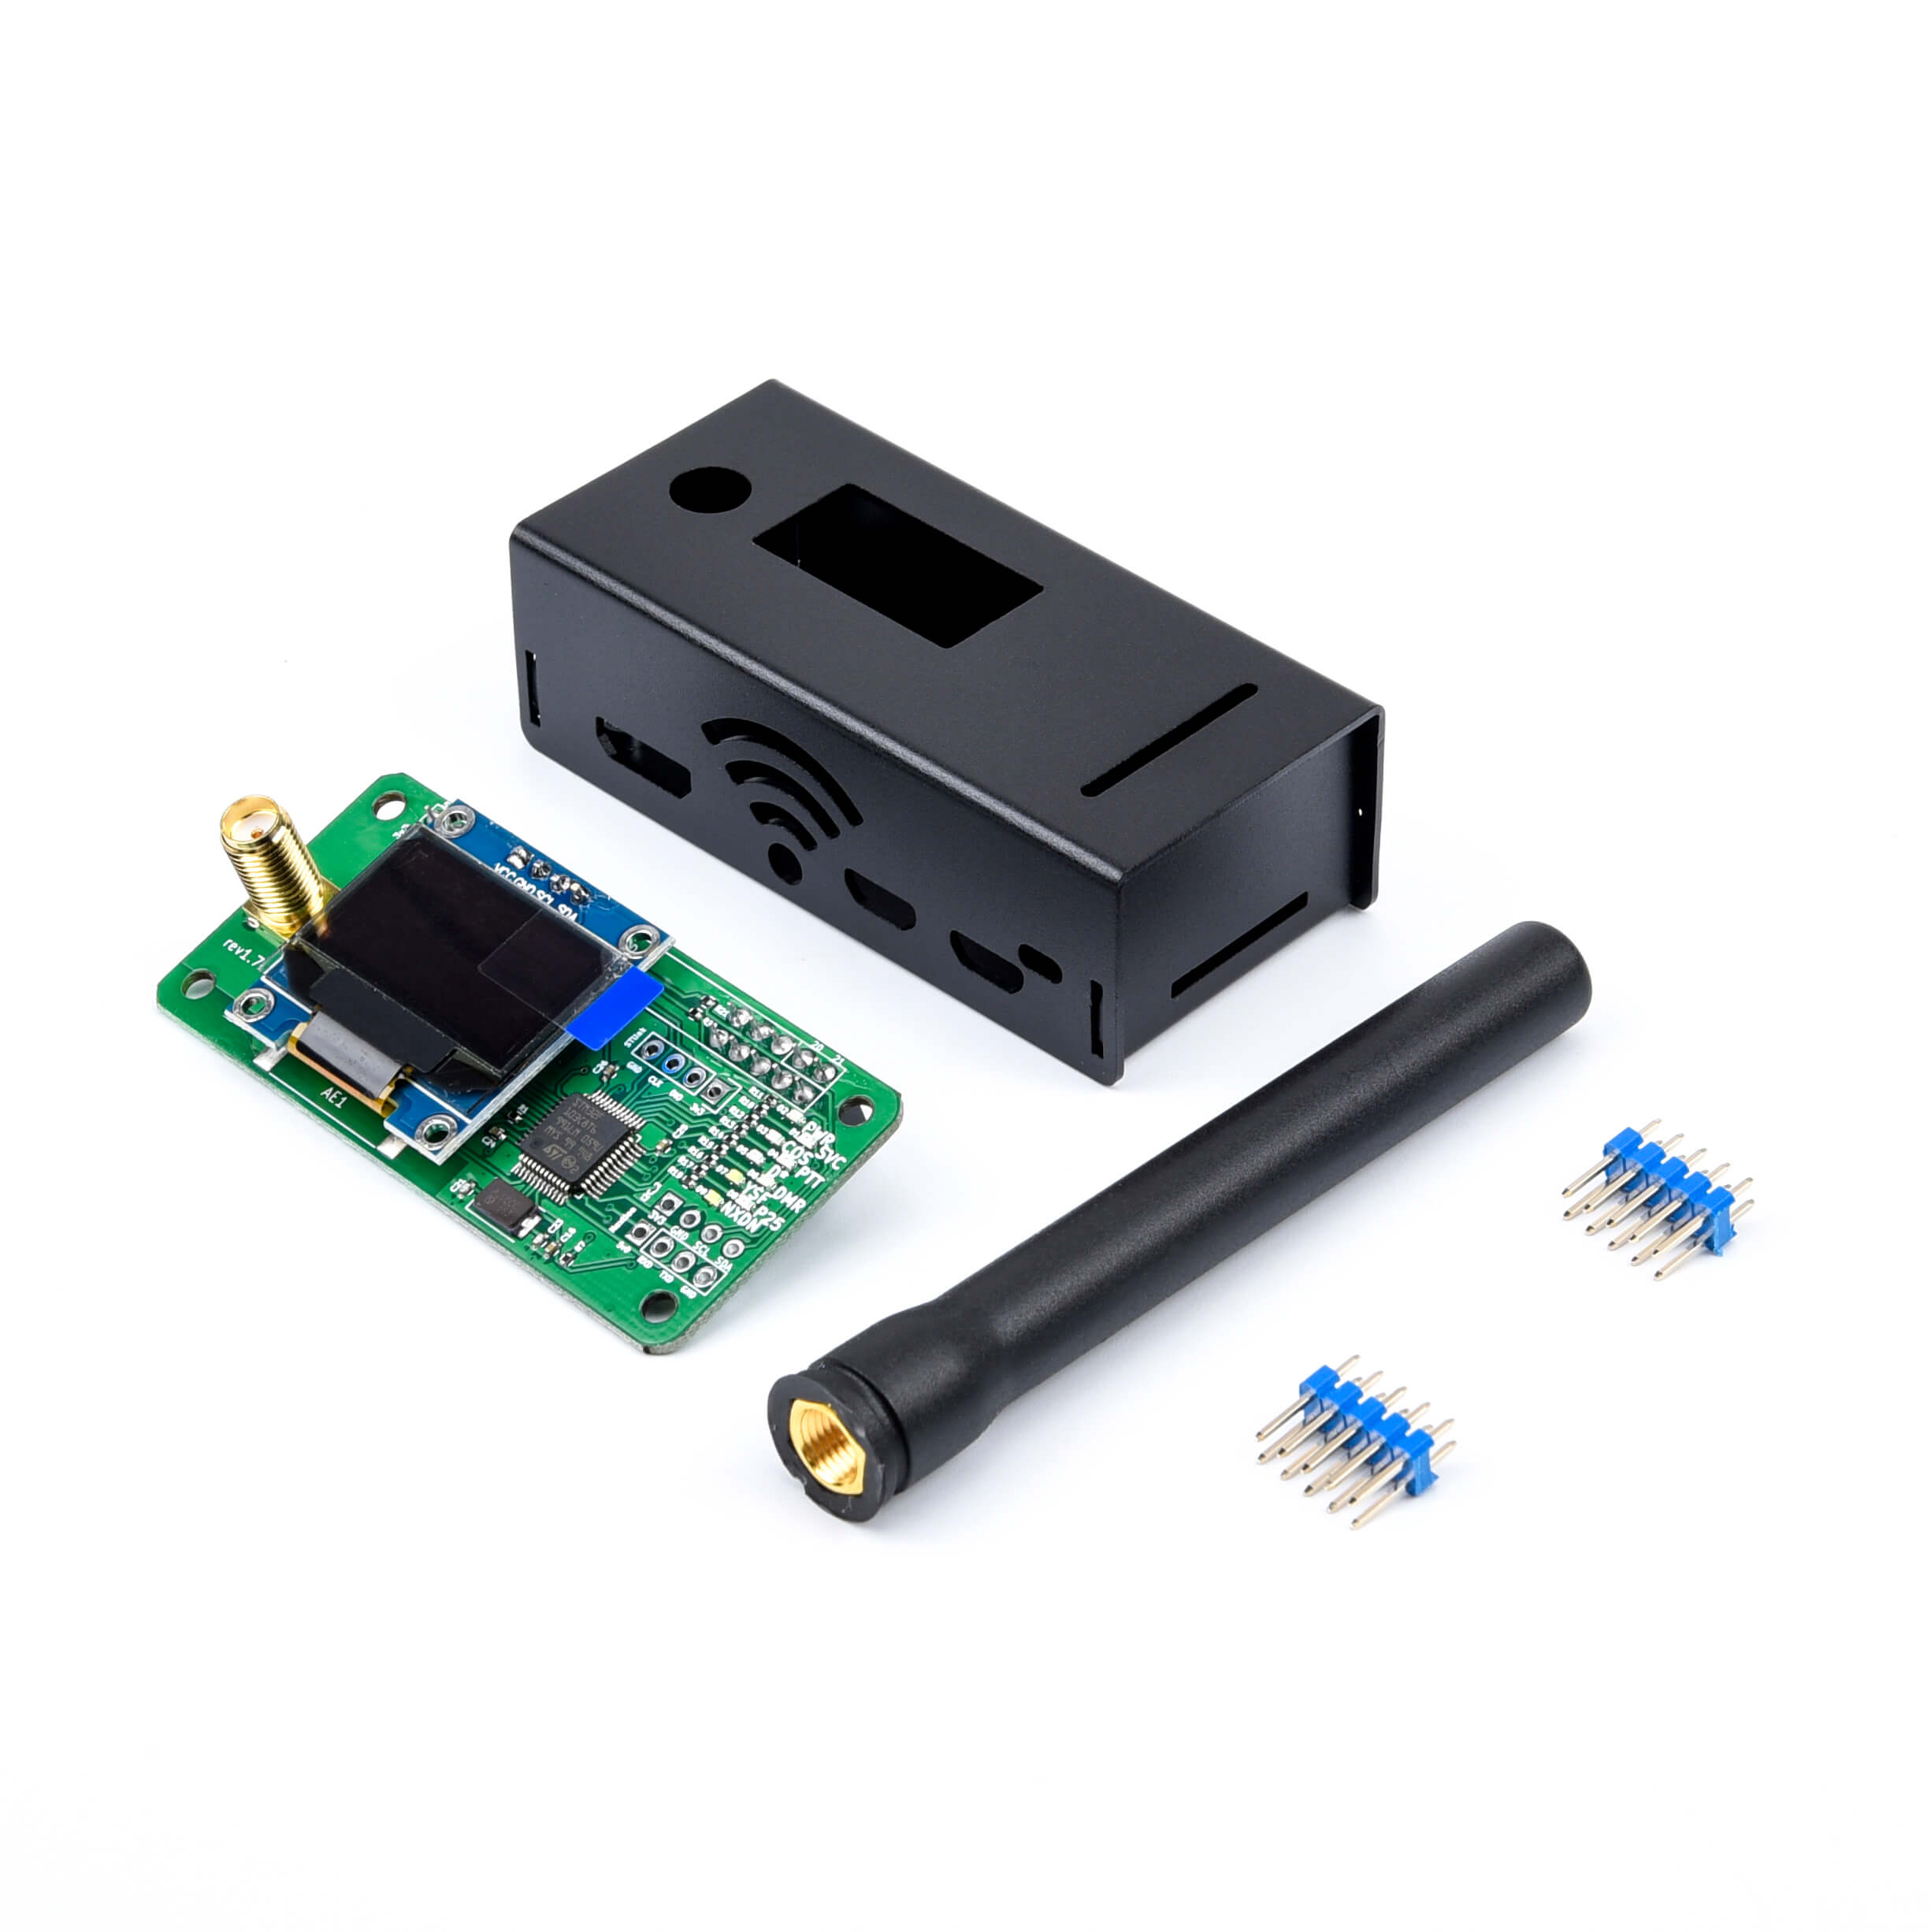 Oferta, Jumbospot UHF y Antena VHF + carcasa de aluminio, hotspot MMDVM compatible con P25 DMR YSF para raspberry pi